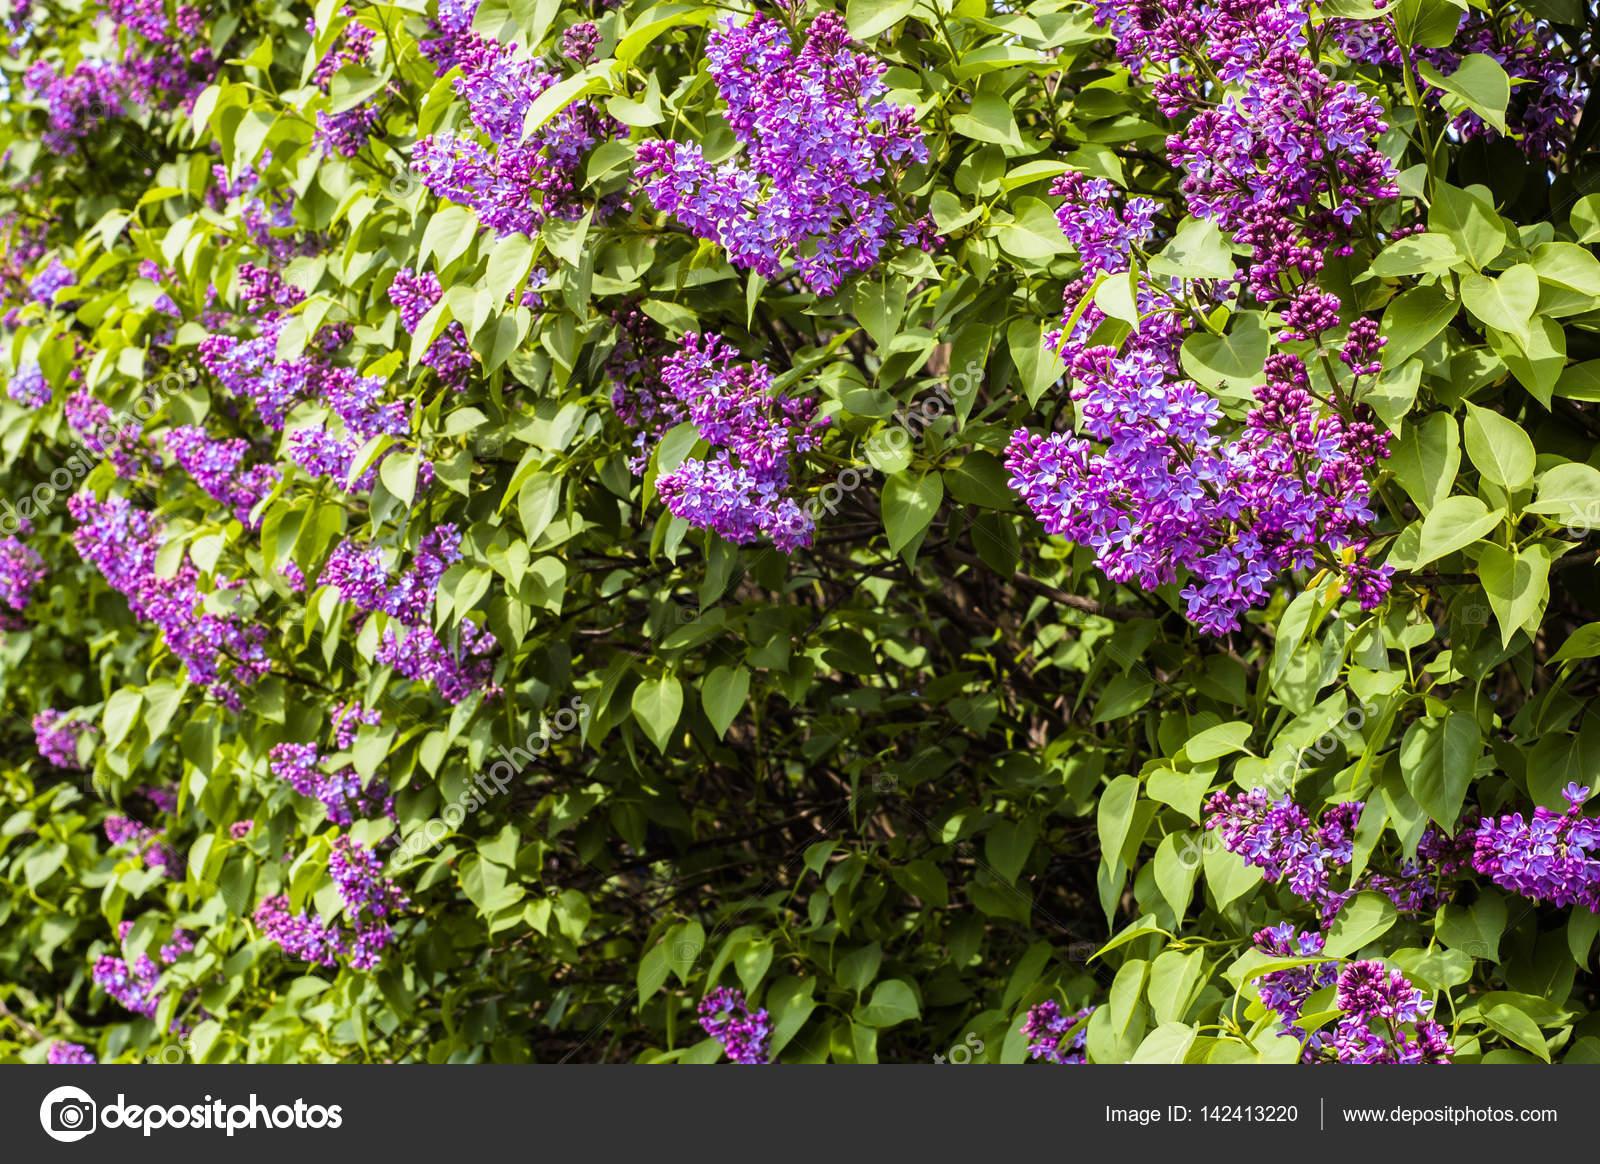 garten blumen lila, blumen lila, frühling blüten im garten — stockfoto © alicjane #142413220, Design ideen